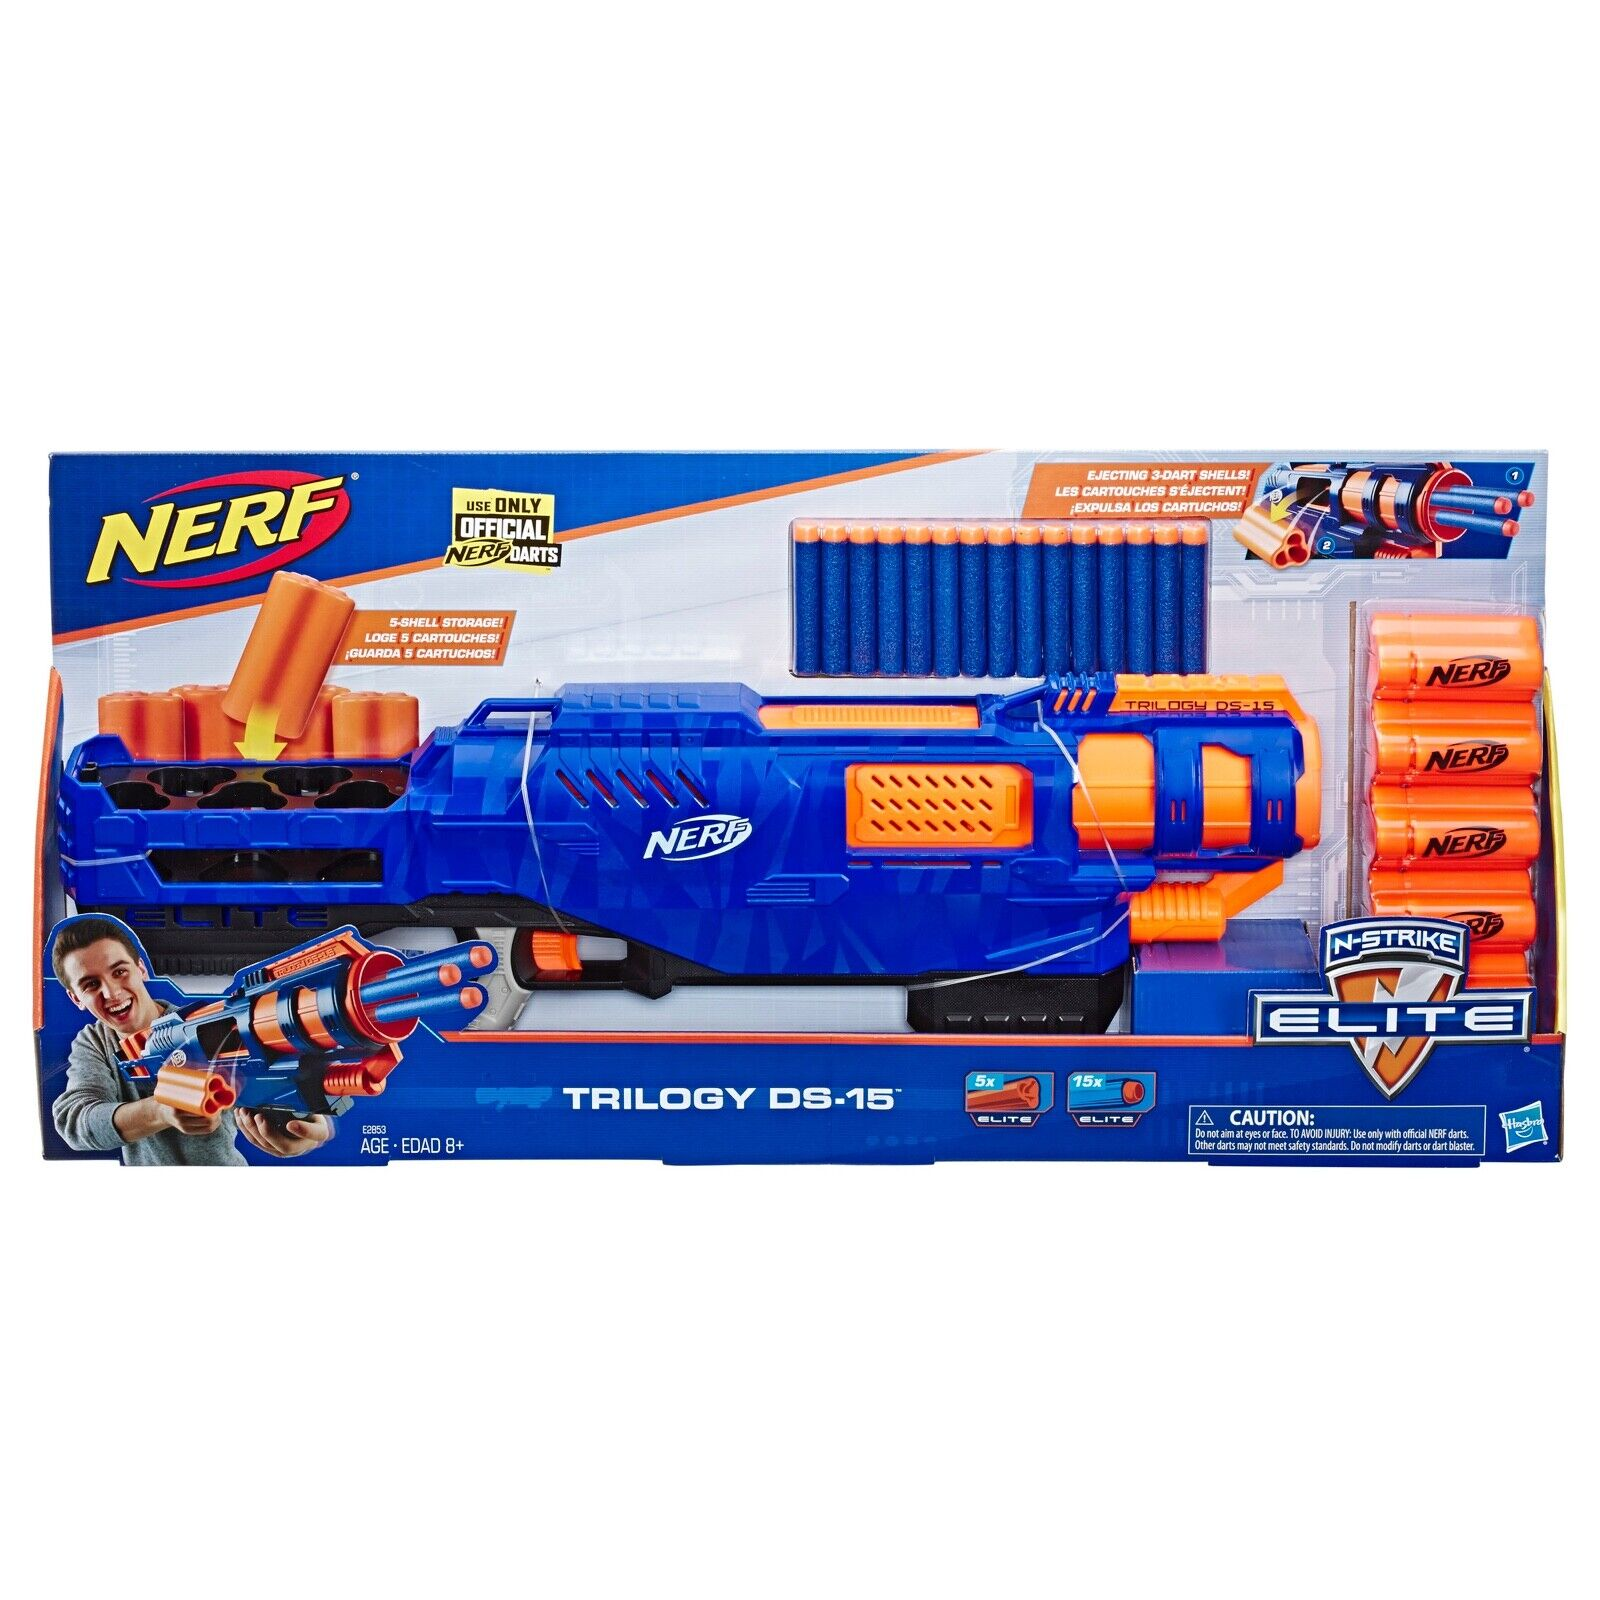 Nerf N Strike Elite Trilogy DS-15 3-Dart expulsar Shell Blaster De Juguete